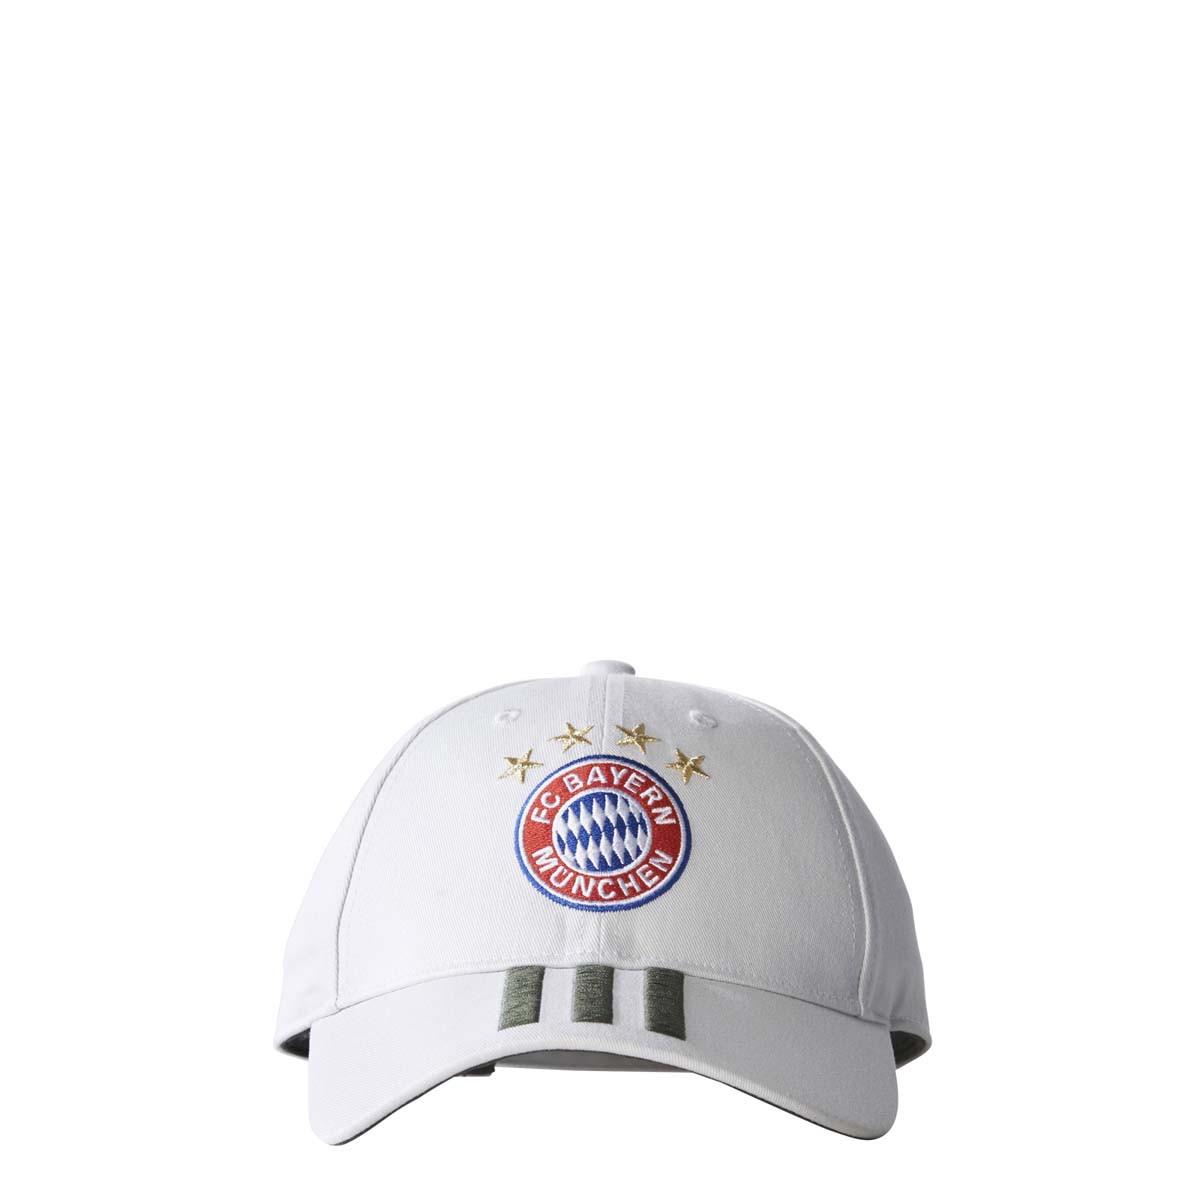 Adidas bayern casquette blanc 2017 2018 for Univers du jardin maule 78